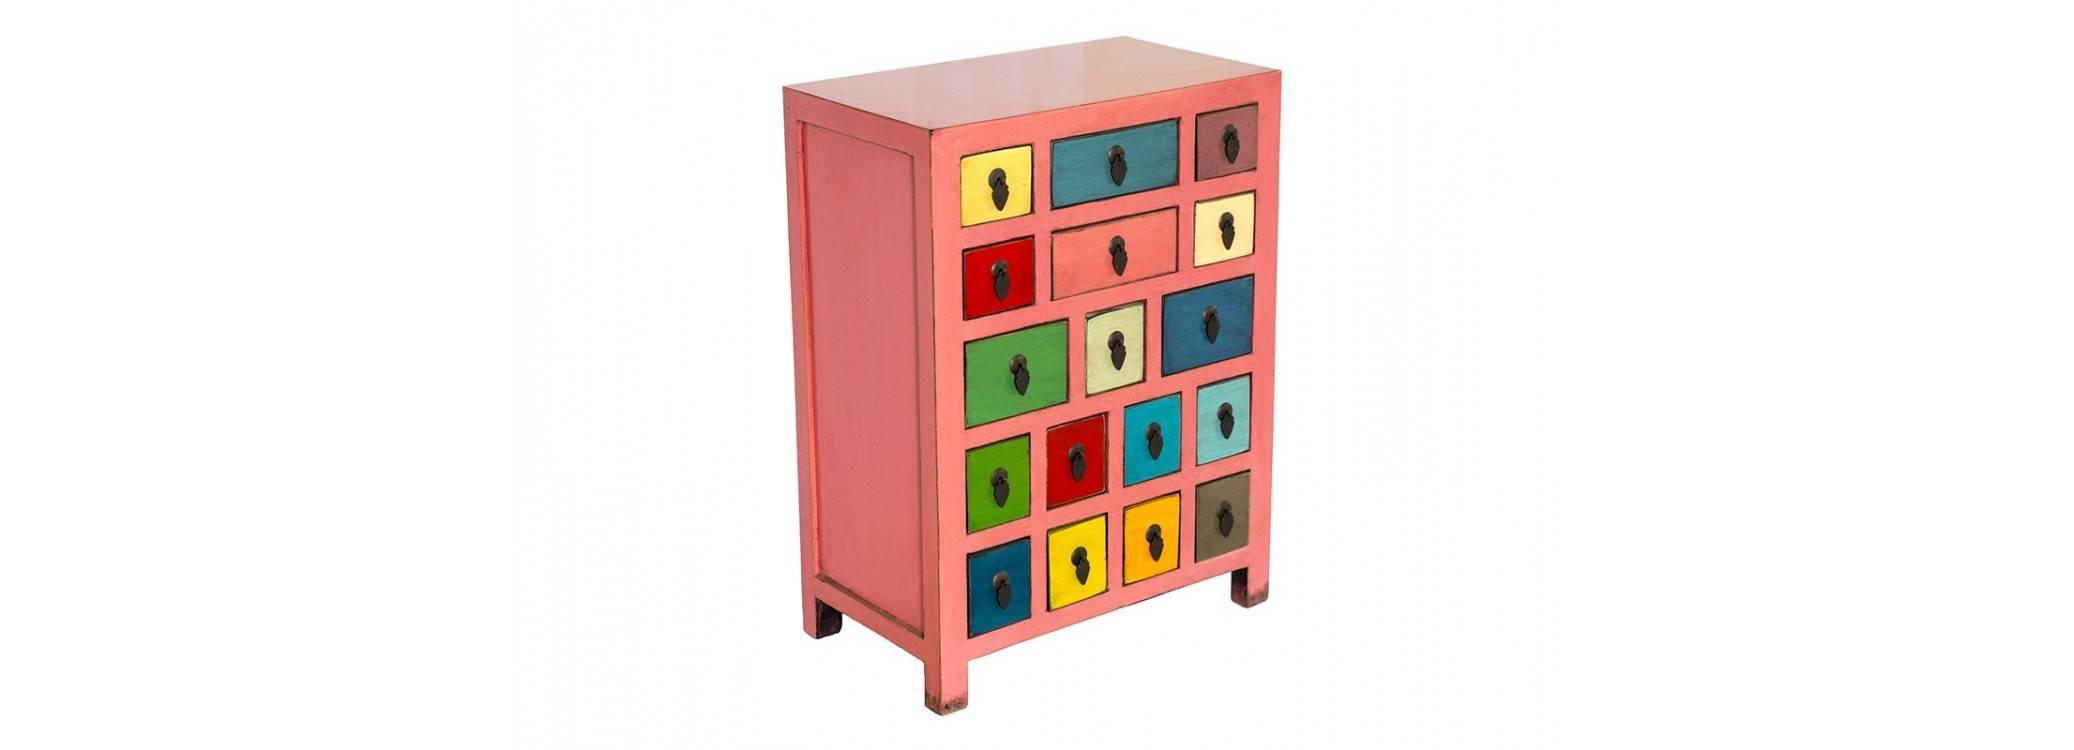 Meuble d'apothicaire Chinois - Multicolore